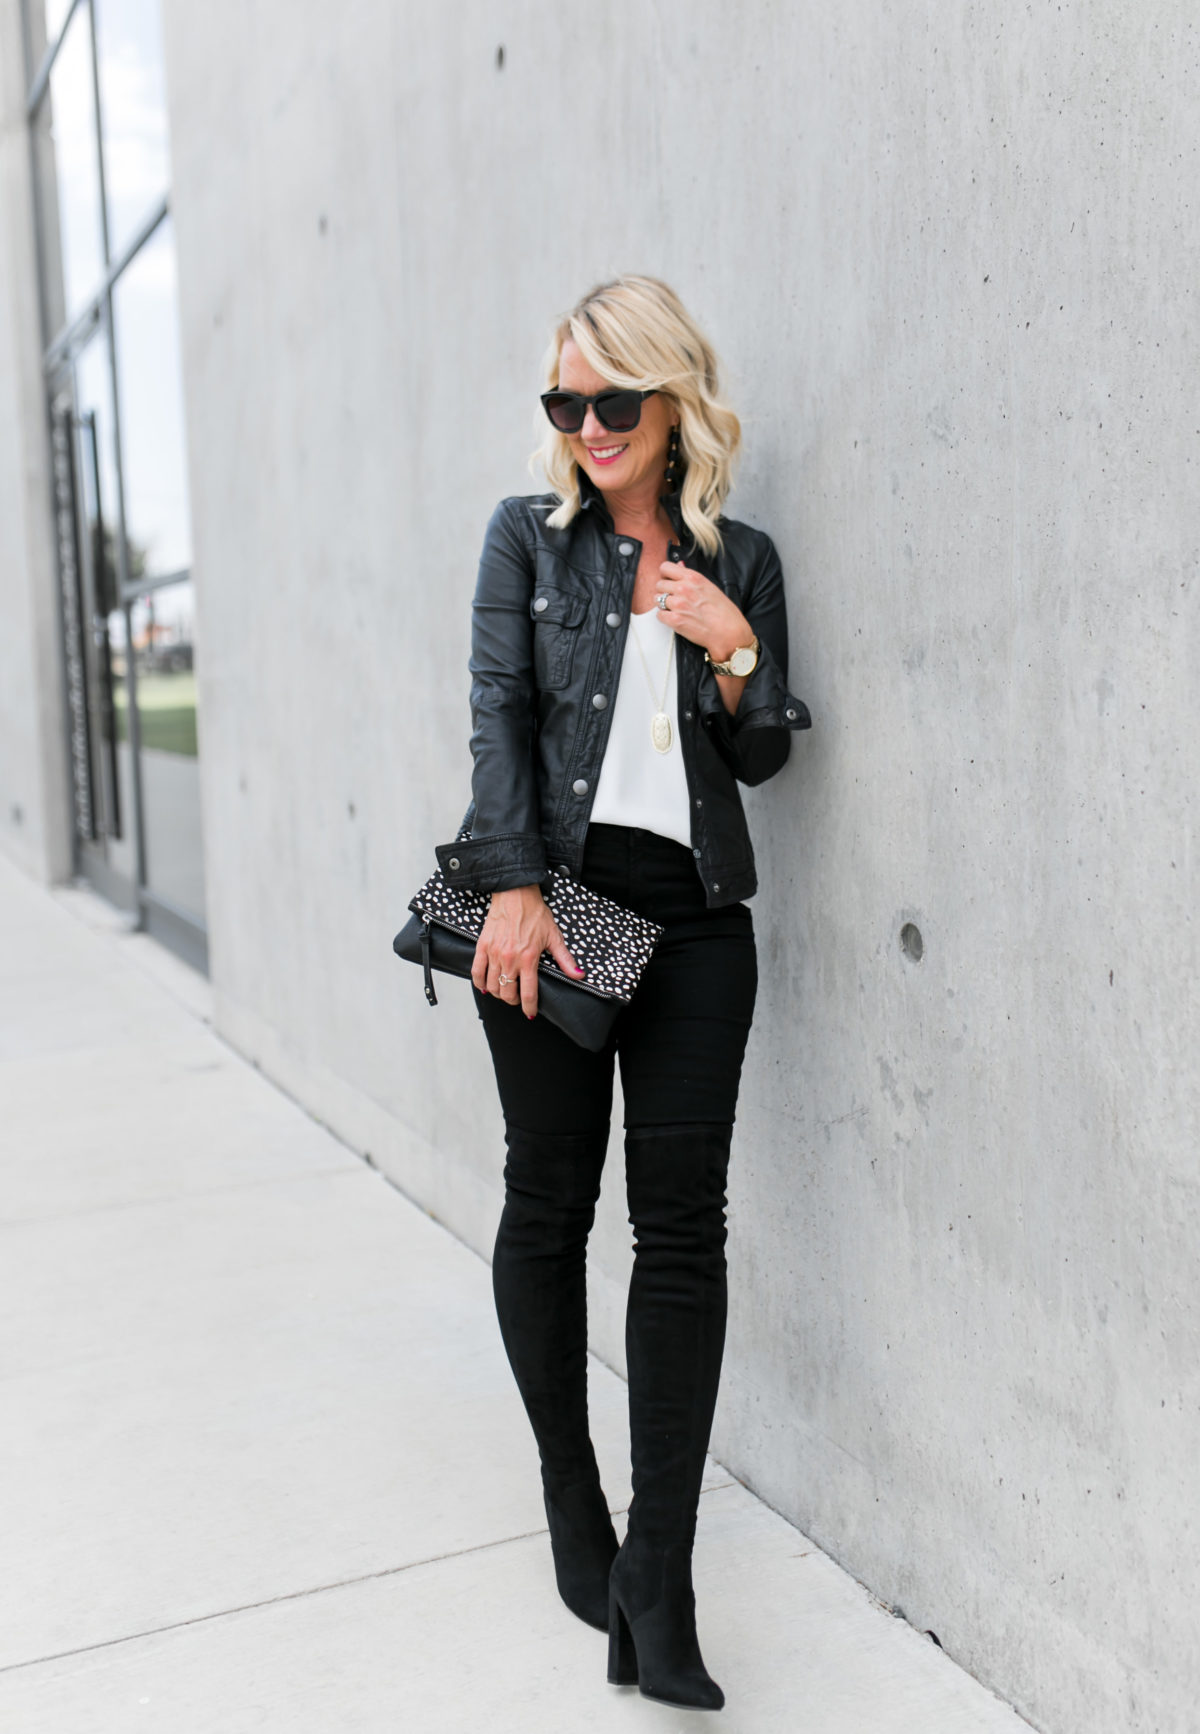 Black Jeans | OTK Boots & Moto Jacket